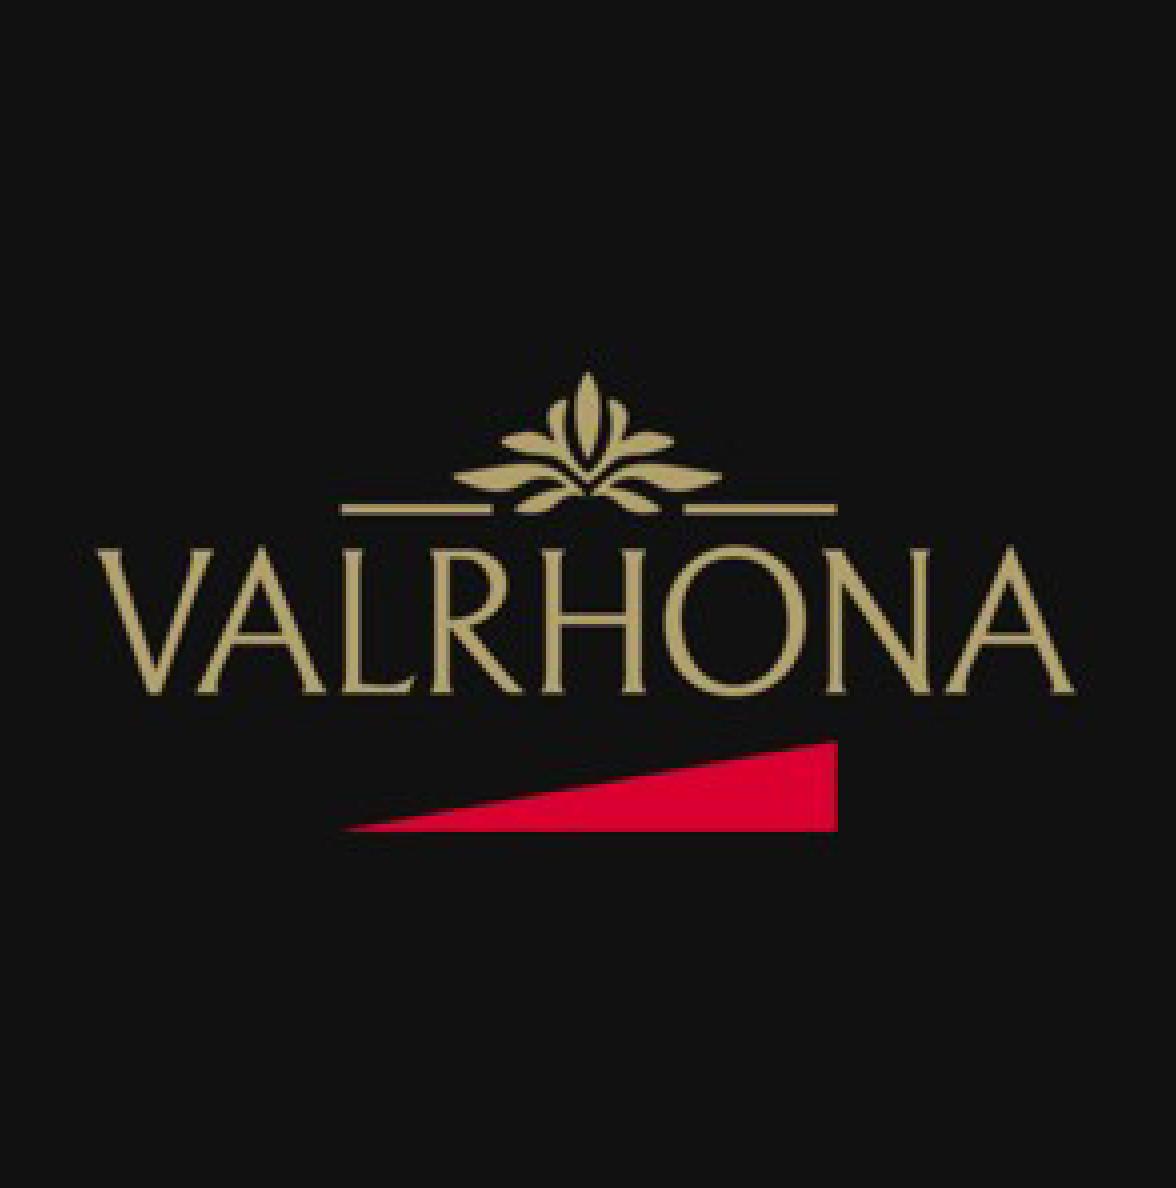 Valrhona Chocolate App Logo